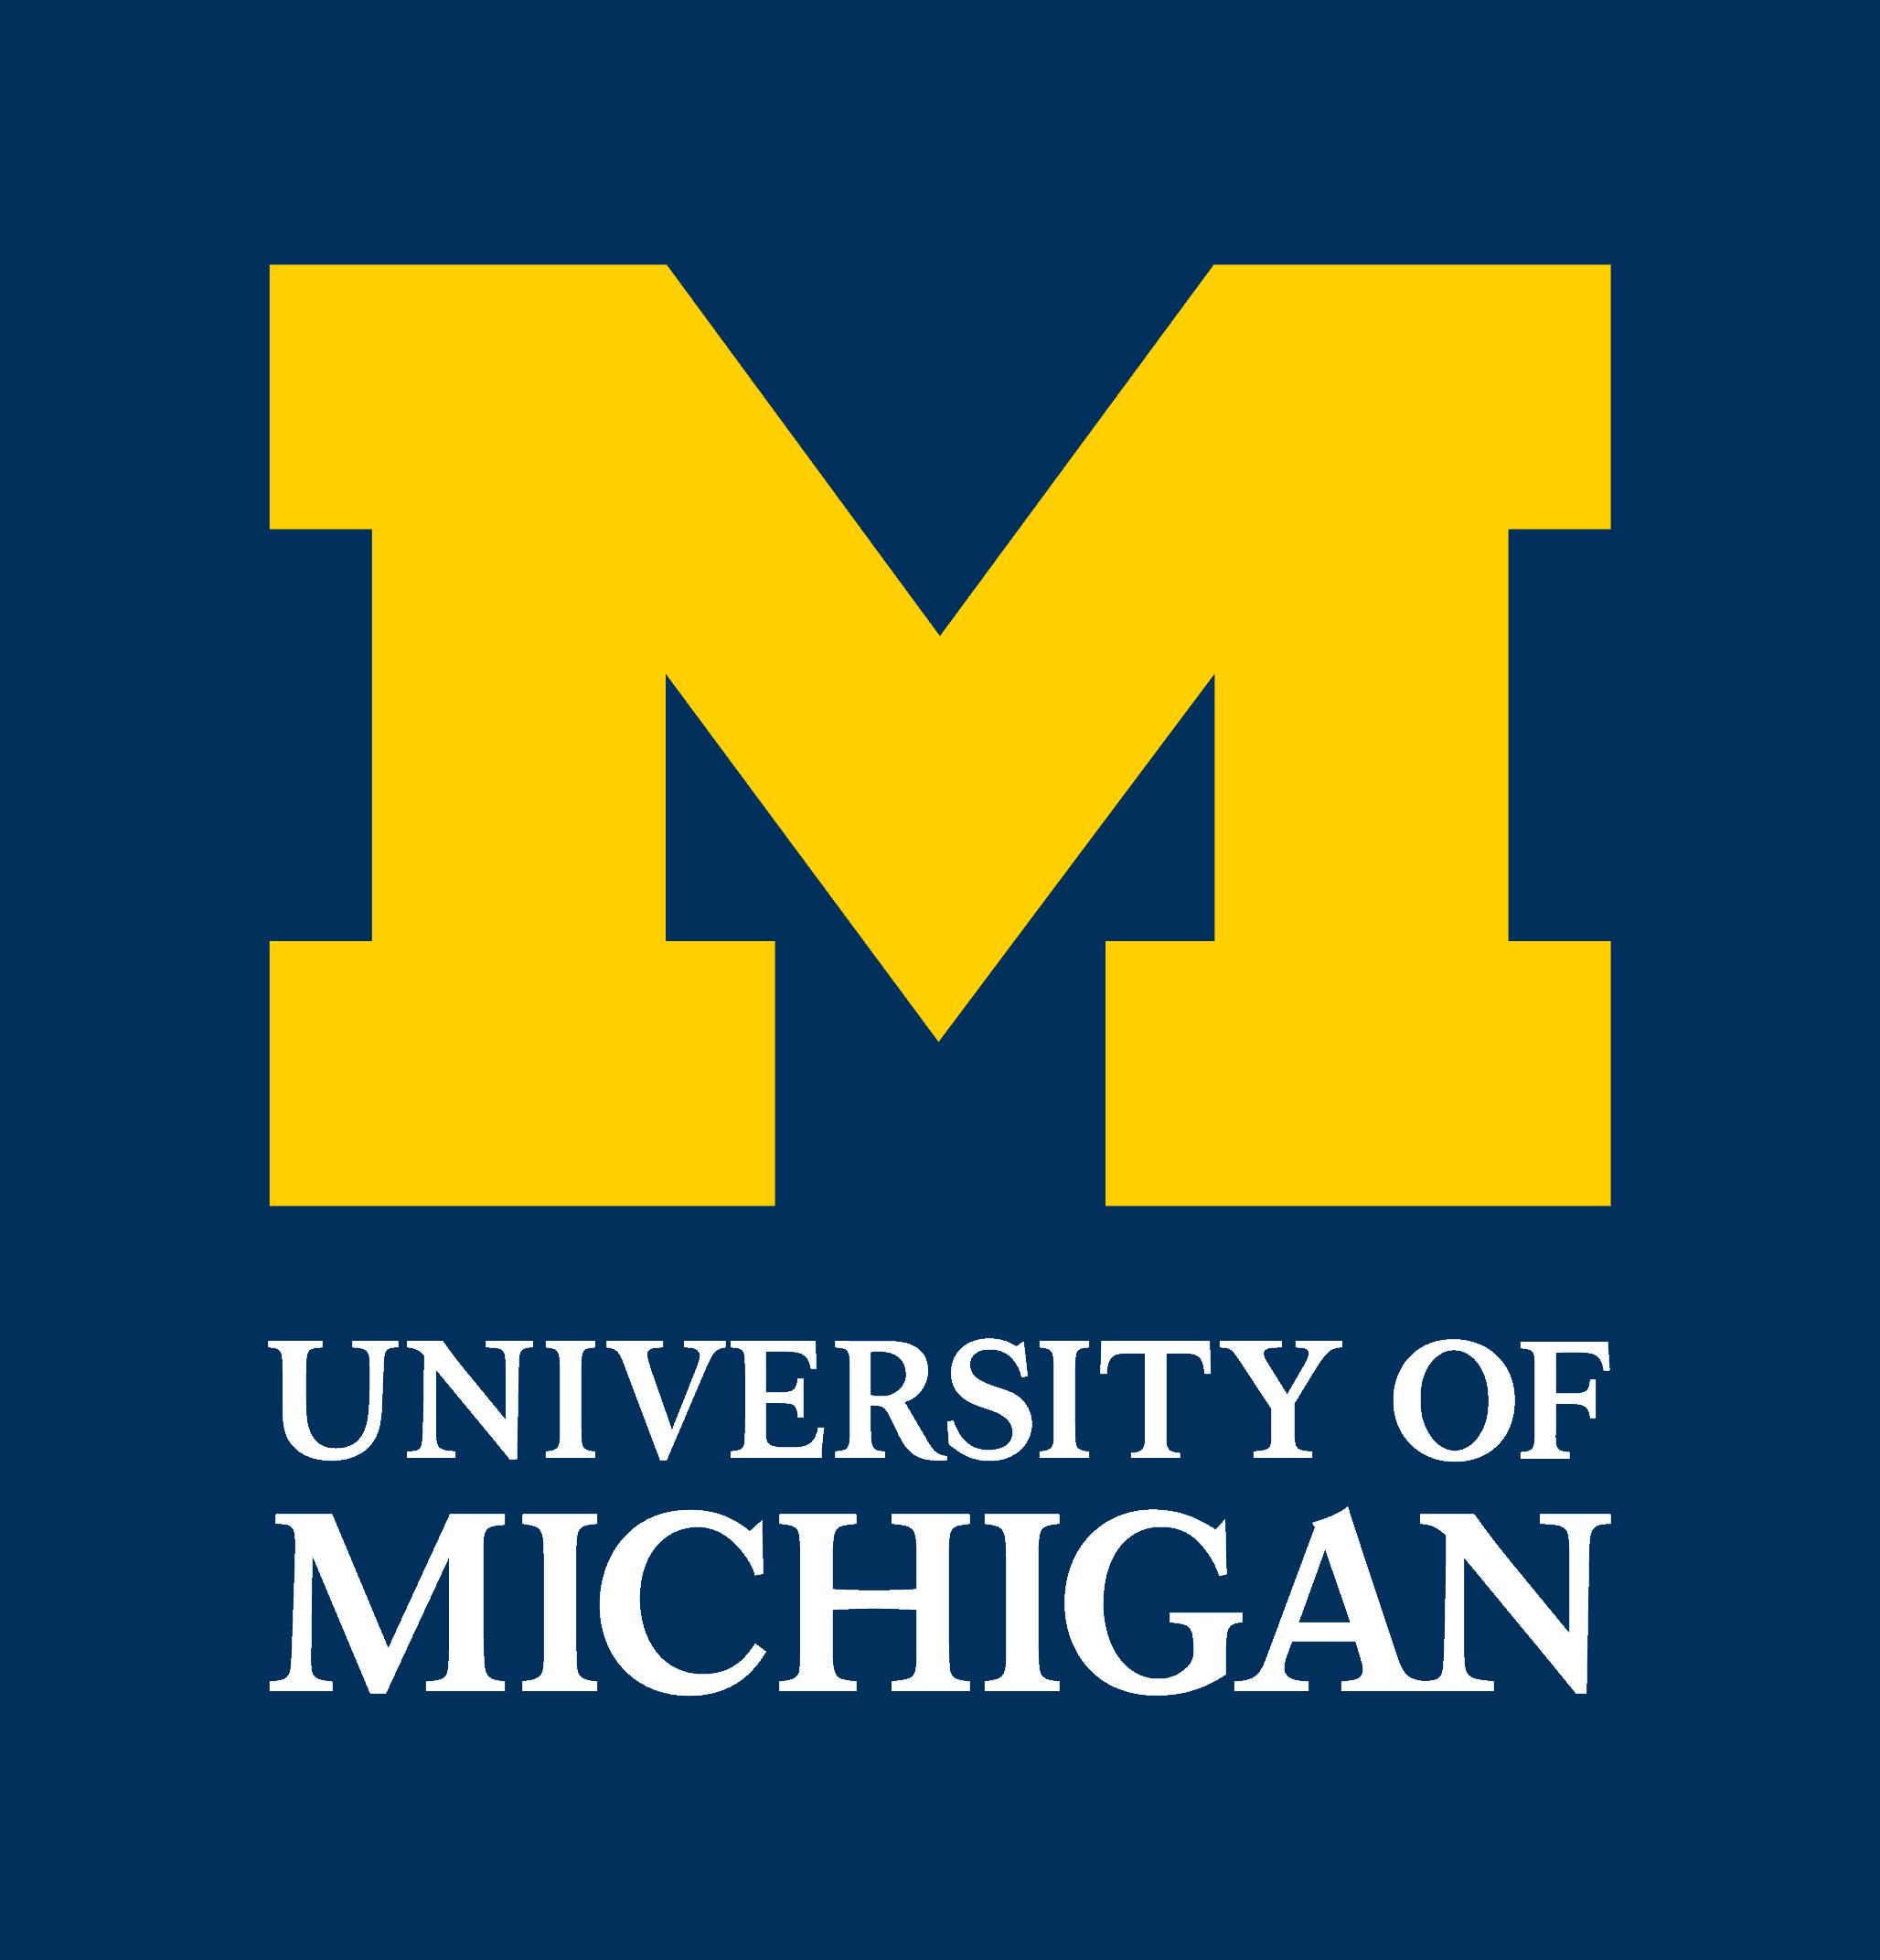 college of engineering university of michigan logo 36361